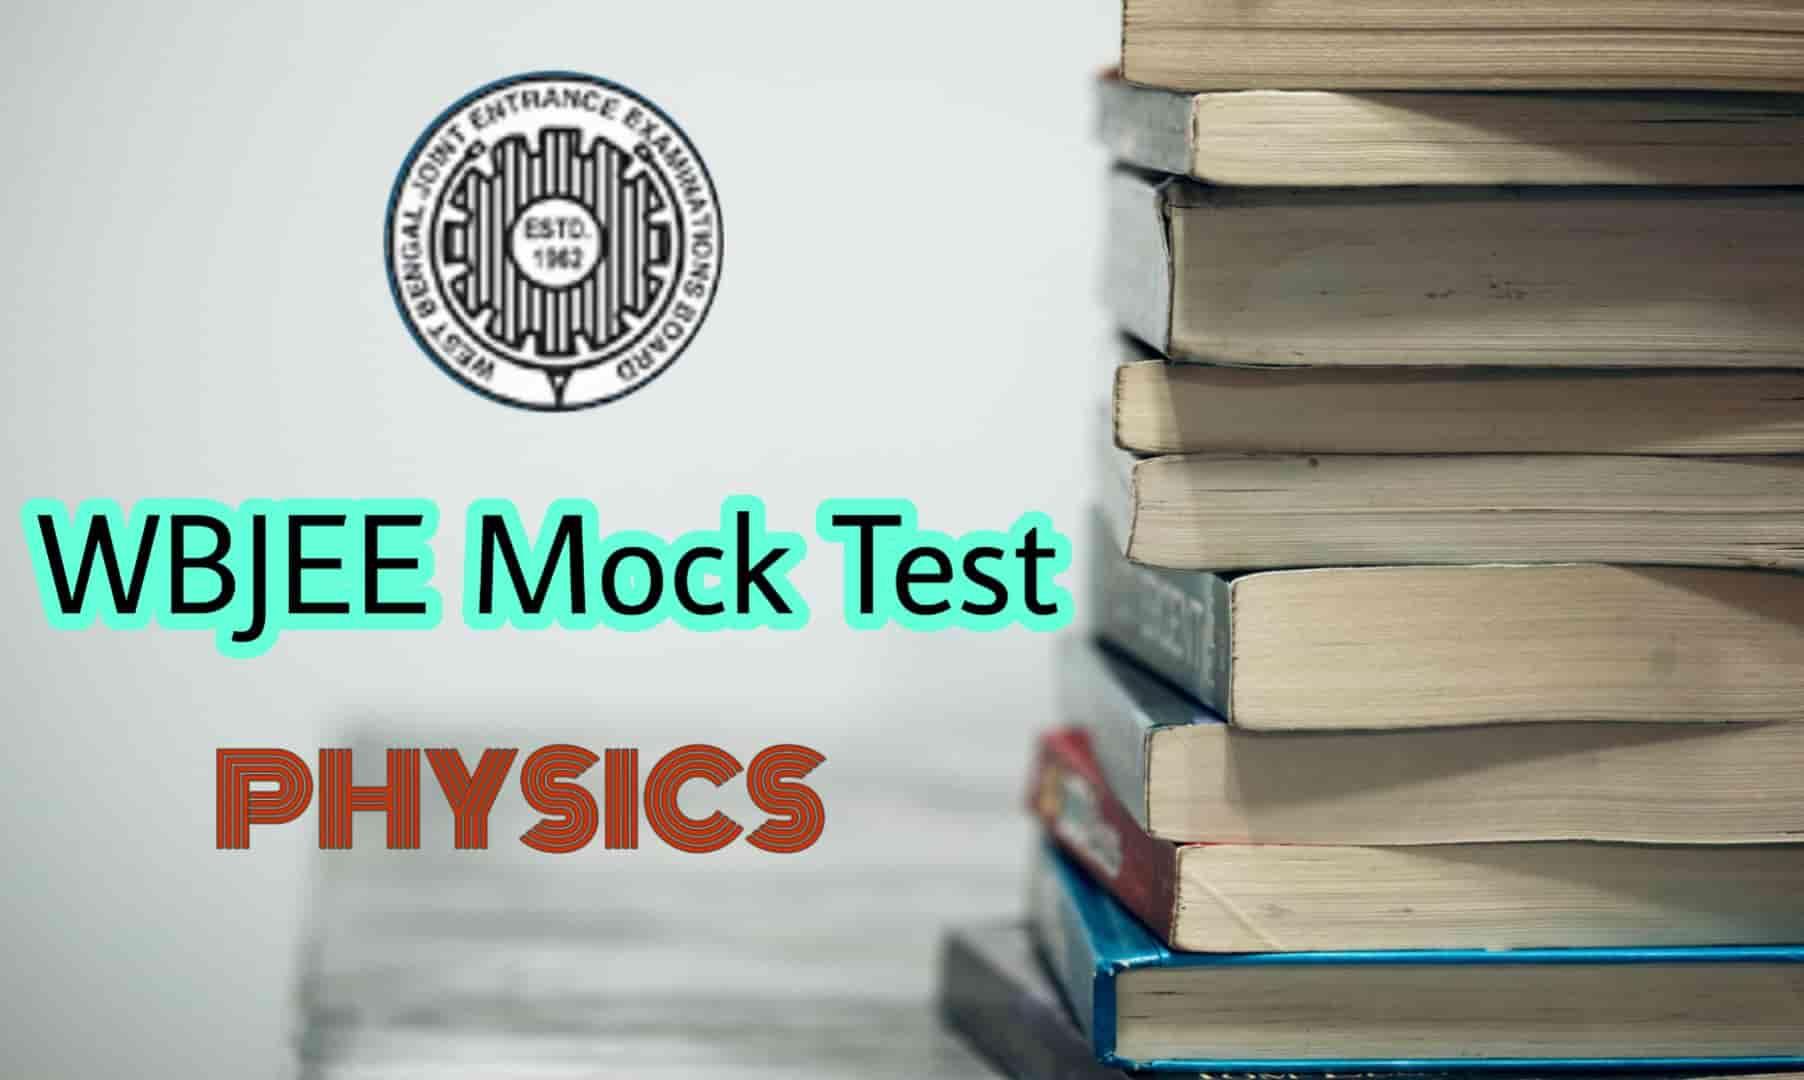 WBJEE 2019 Physics Mock Test